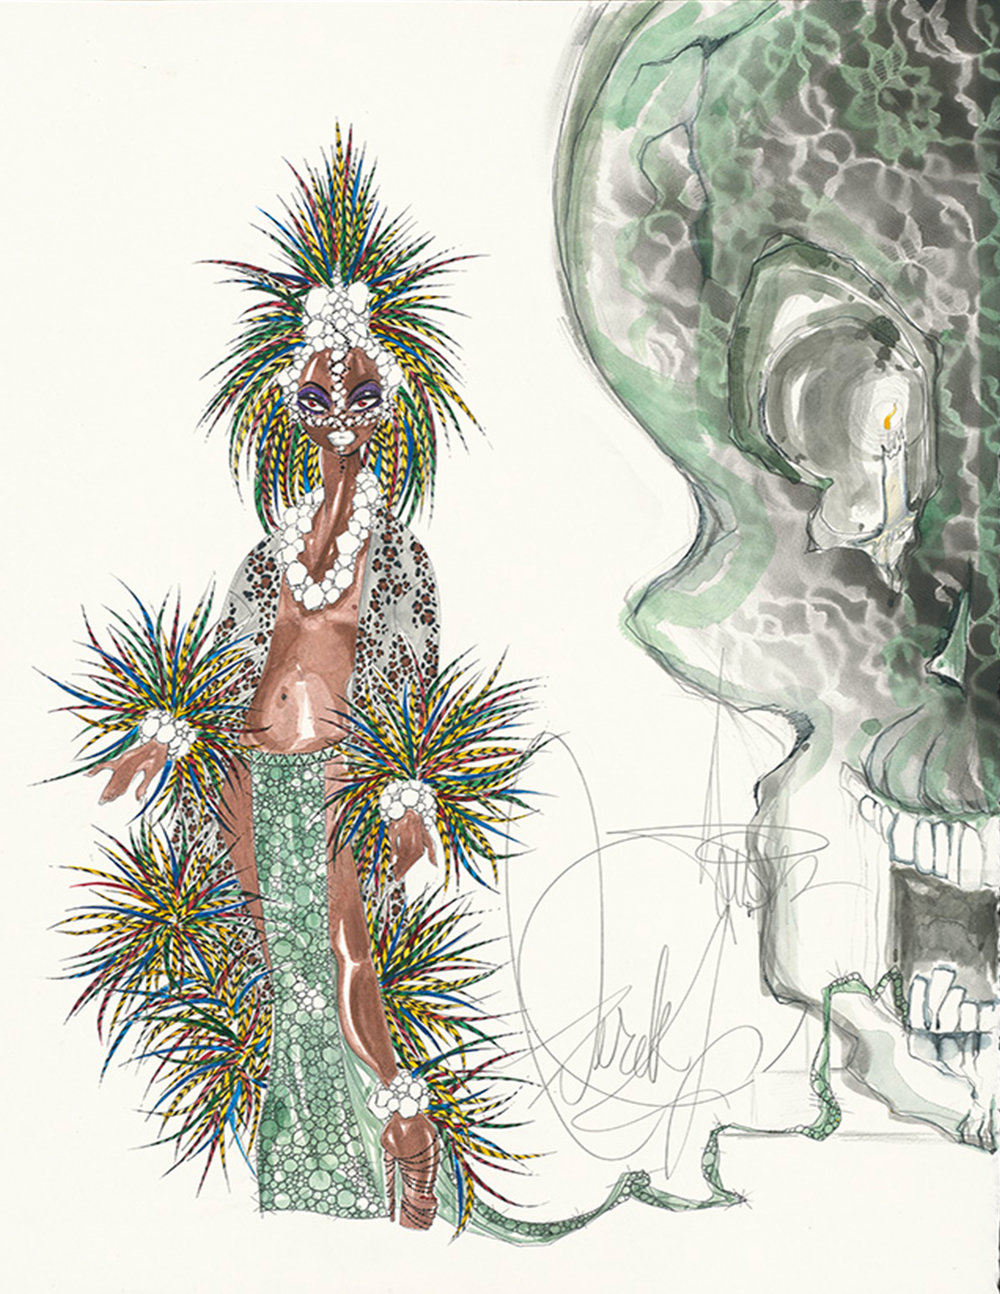 Gallery_Seven_176204_feather_headdress.jpg